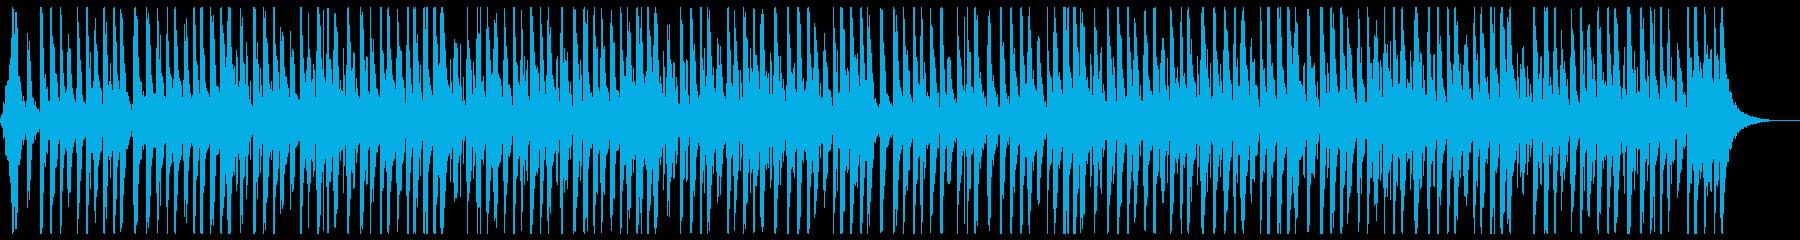 Body Beatの再生済みの波形